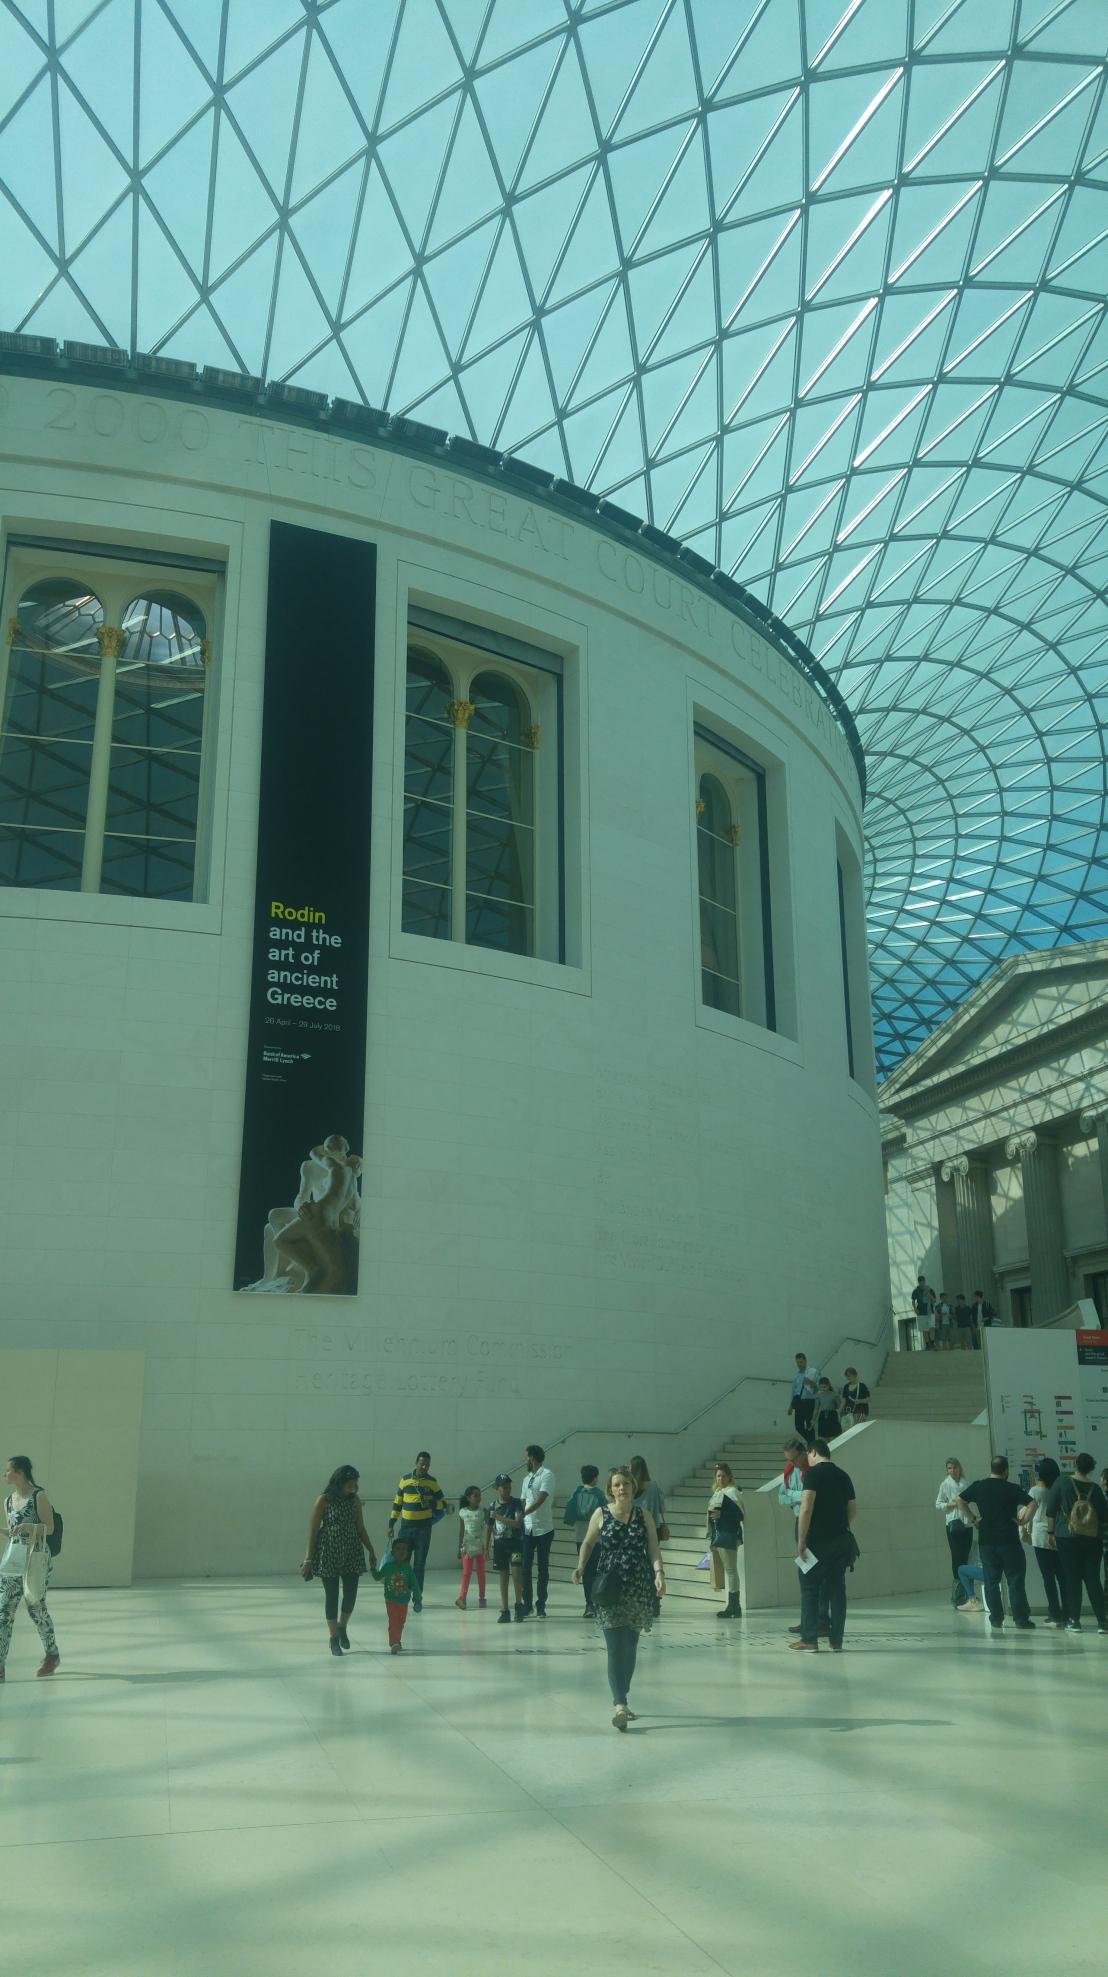 London trip - British museum